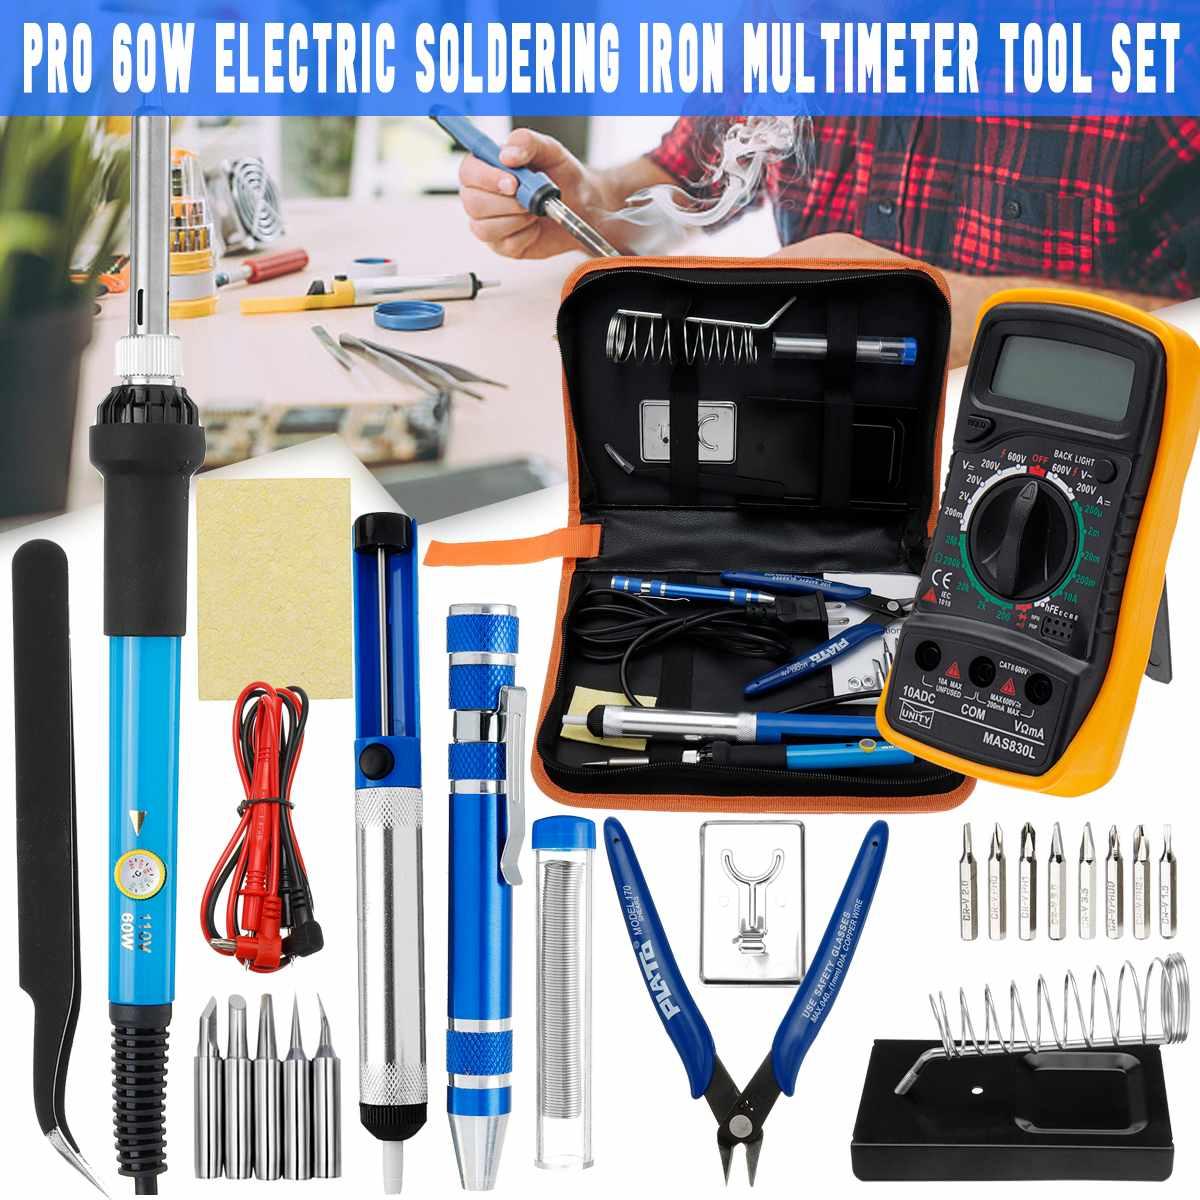 25 In1 60W AC 110V/220V Electric Adjustable Soldering Iron Welding Digital Multimeter Tool Kit Long Lasting Electronics Work